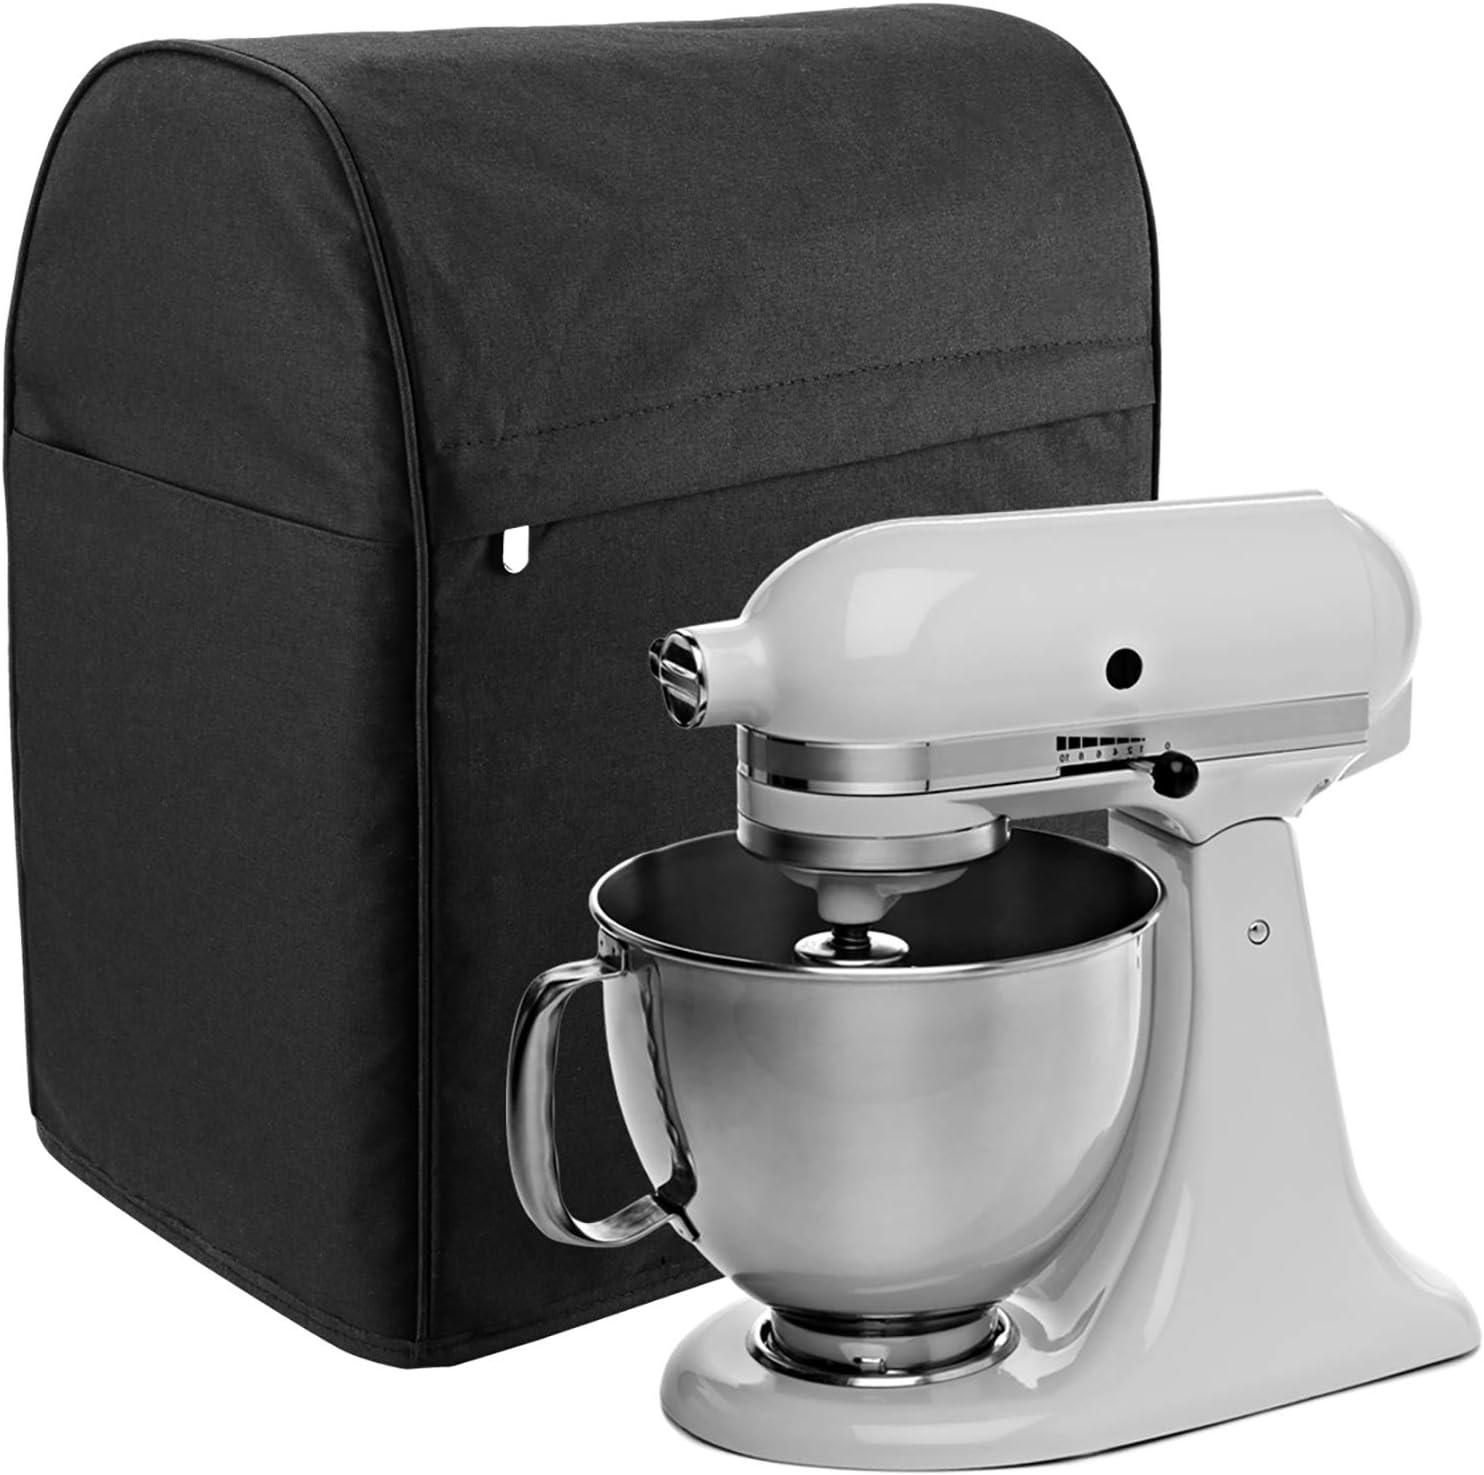 Beige Stand Mixer Dust Cover Mixer Dust&Fingerprint Protection ...